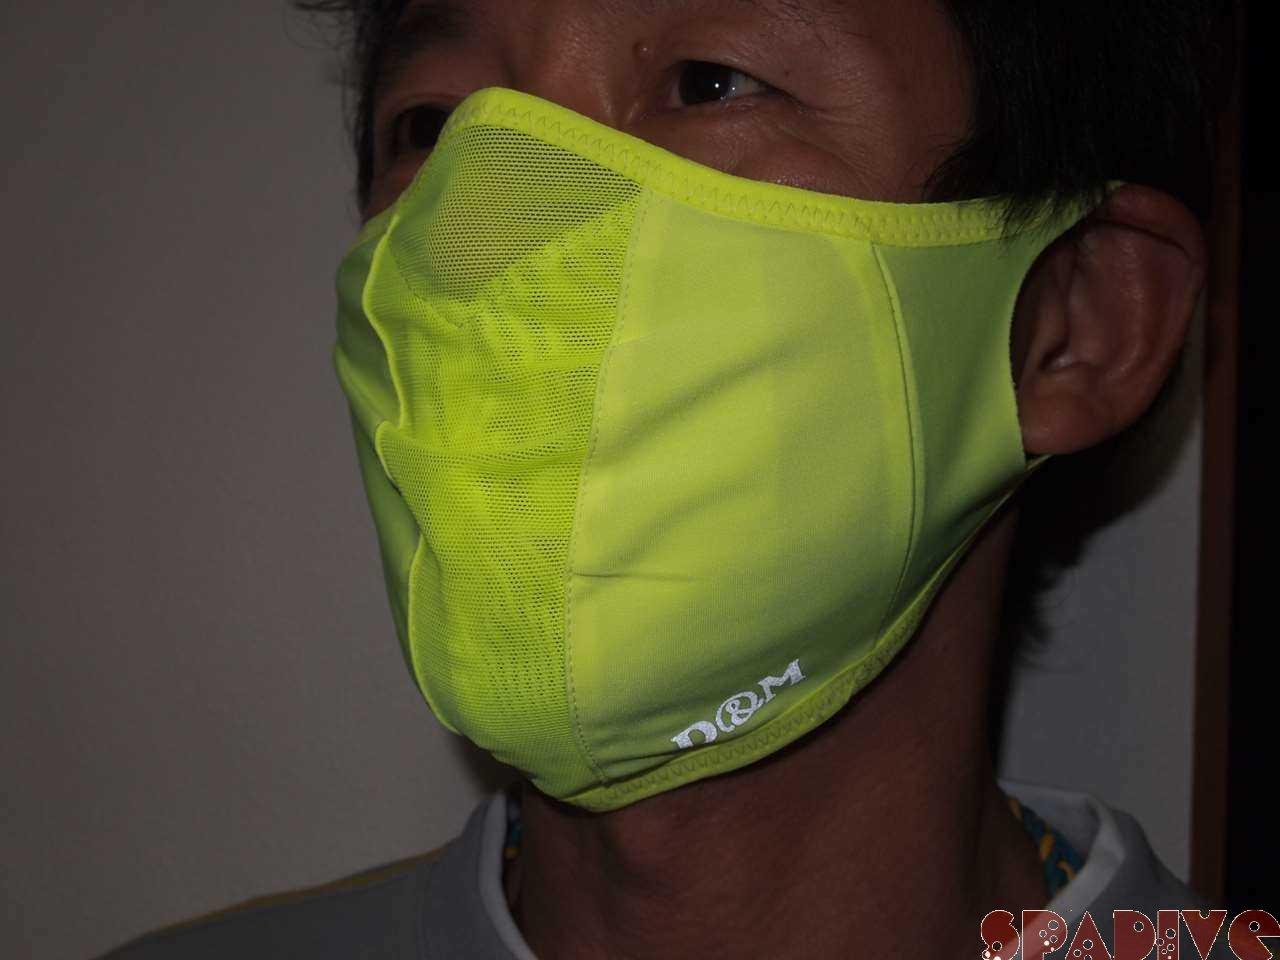 D&Mランナーマスク|実際のランニング使用感と比較(SSK、PITTA MASK)